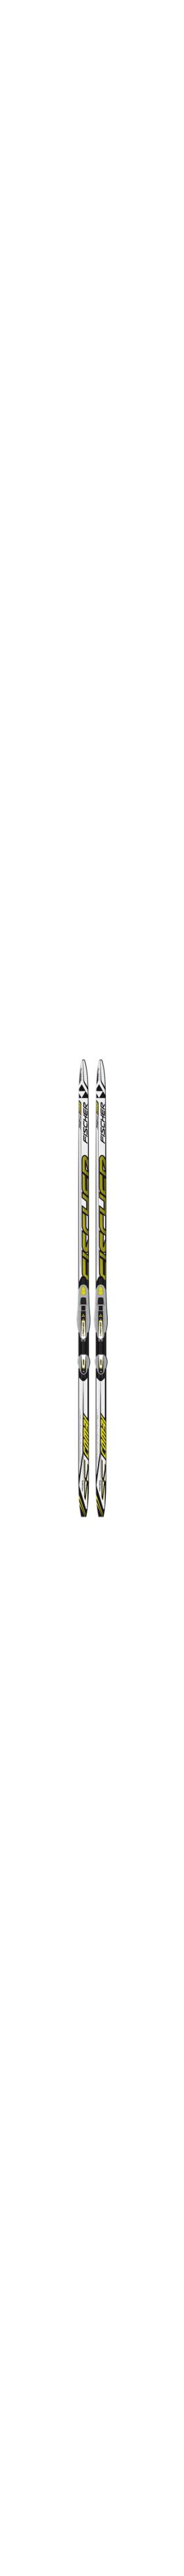 Пластиковые лыжи FISCHER SC COMBI, фото 1